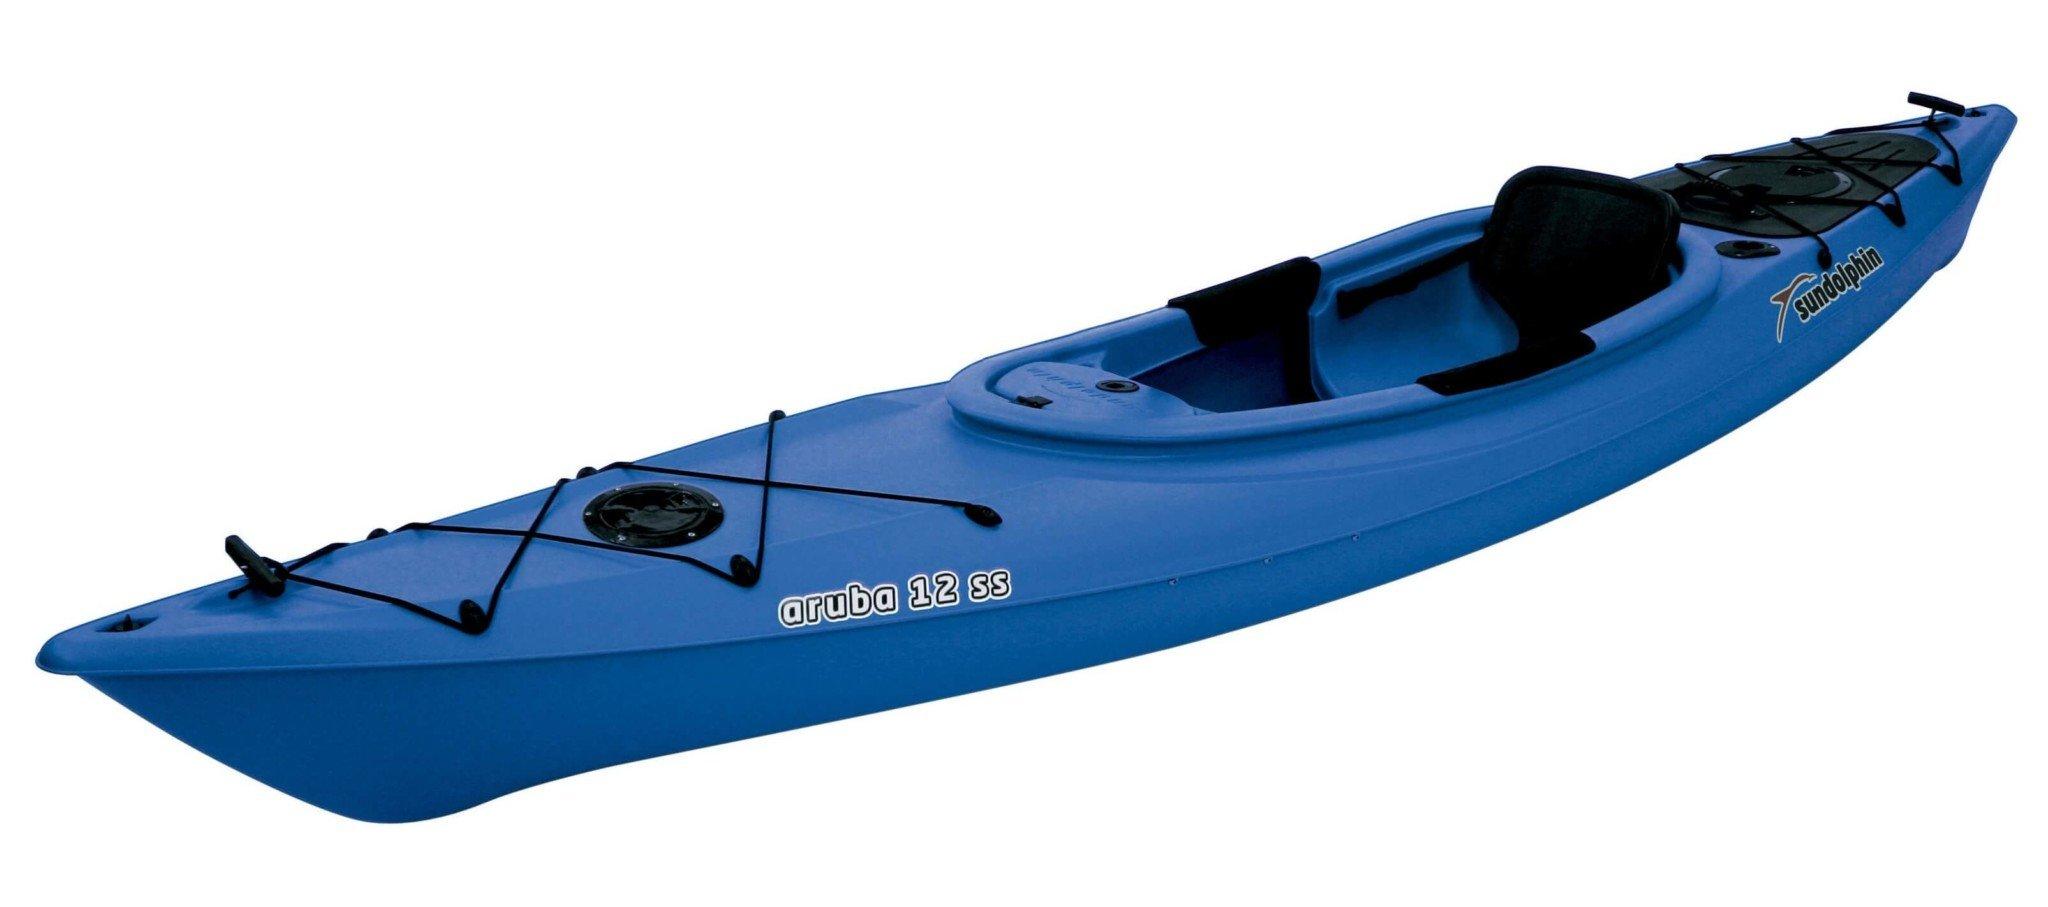 Sun-Dolphin-Aruba-12-SS-Sit-In-Kayak-Reviews-e1449935591353